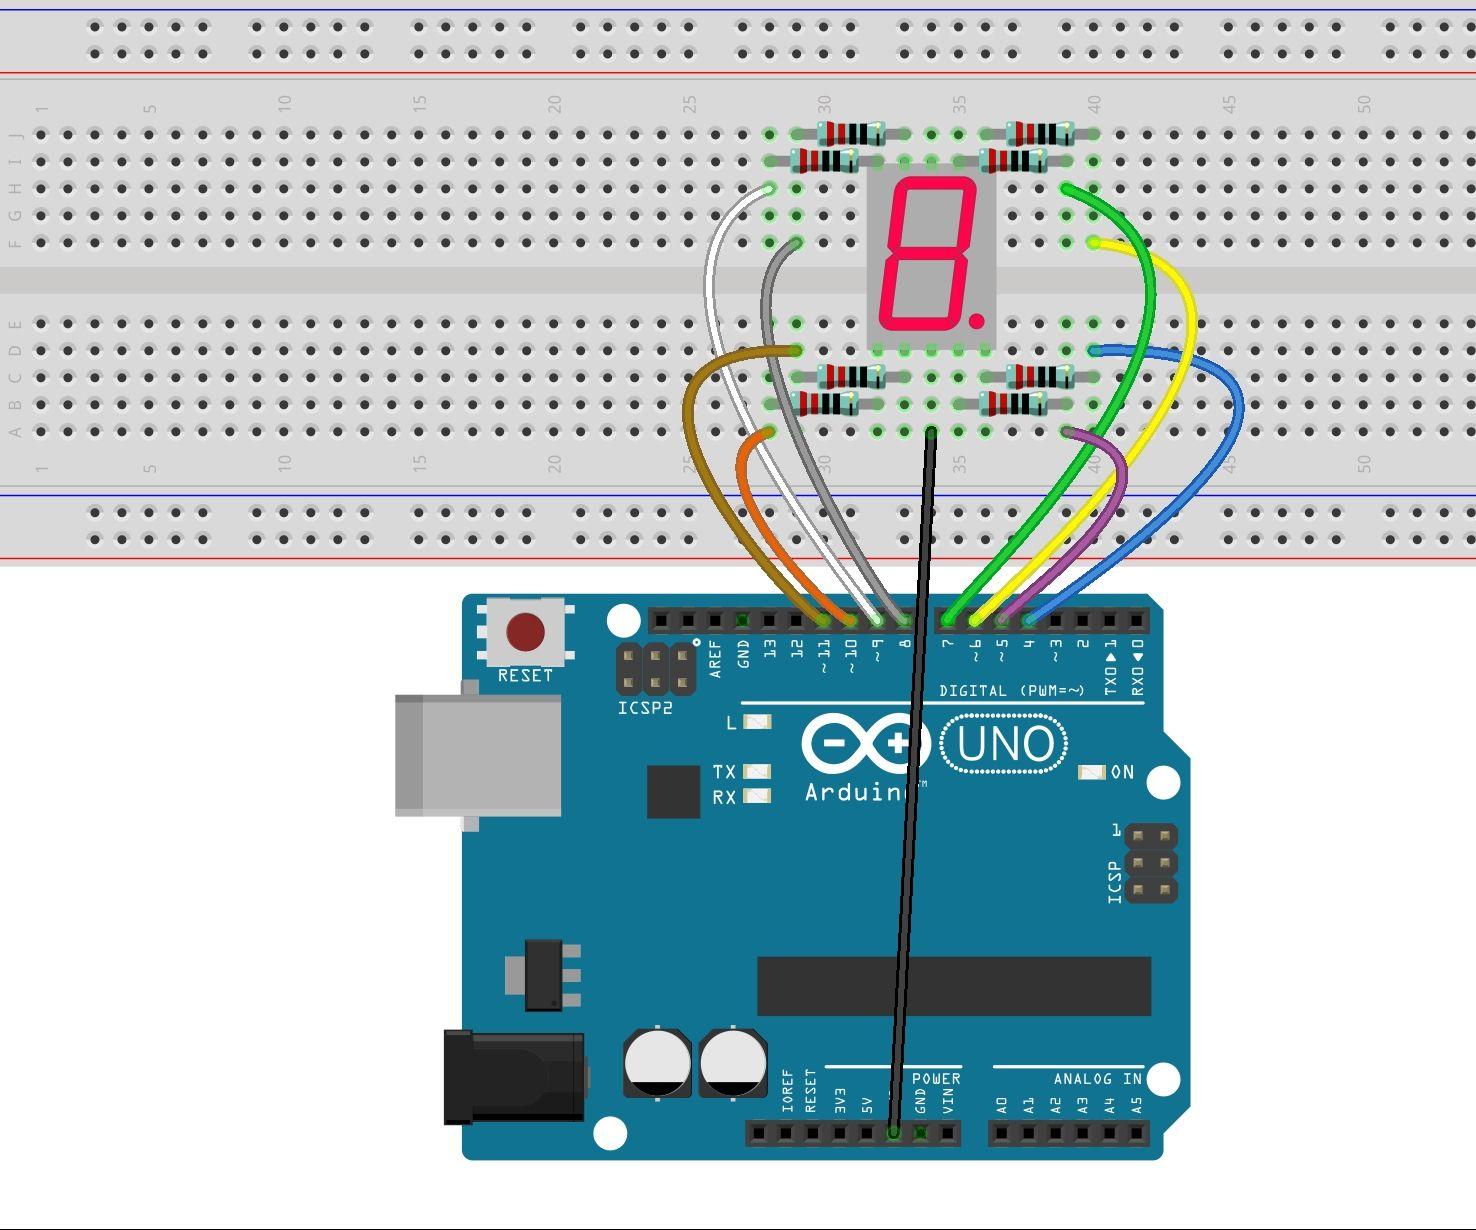 7-segment Display Using Arduino Uno R3